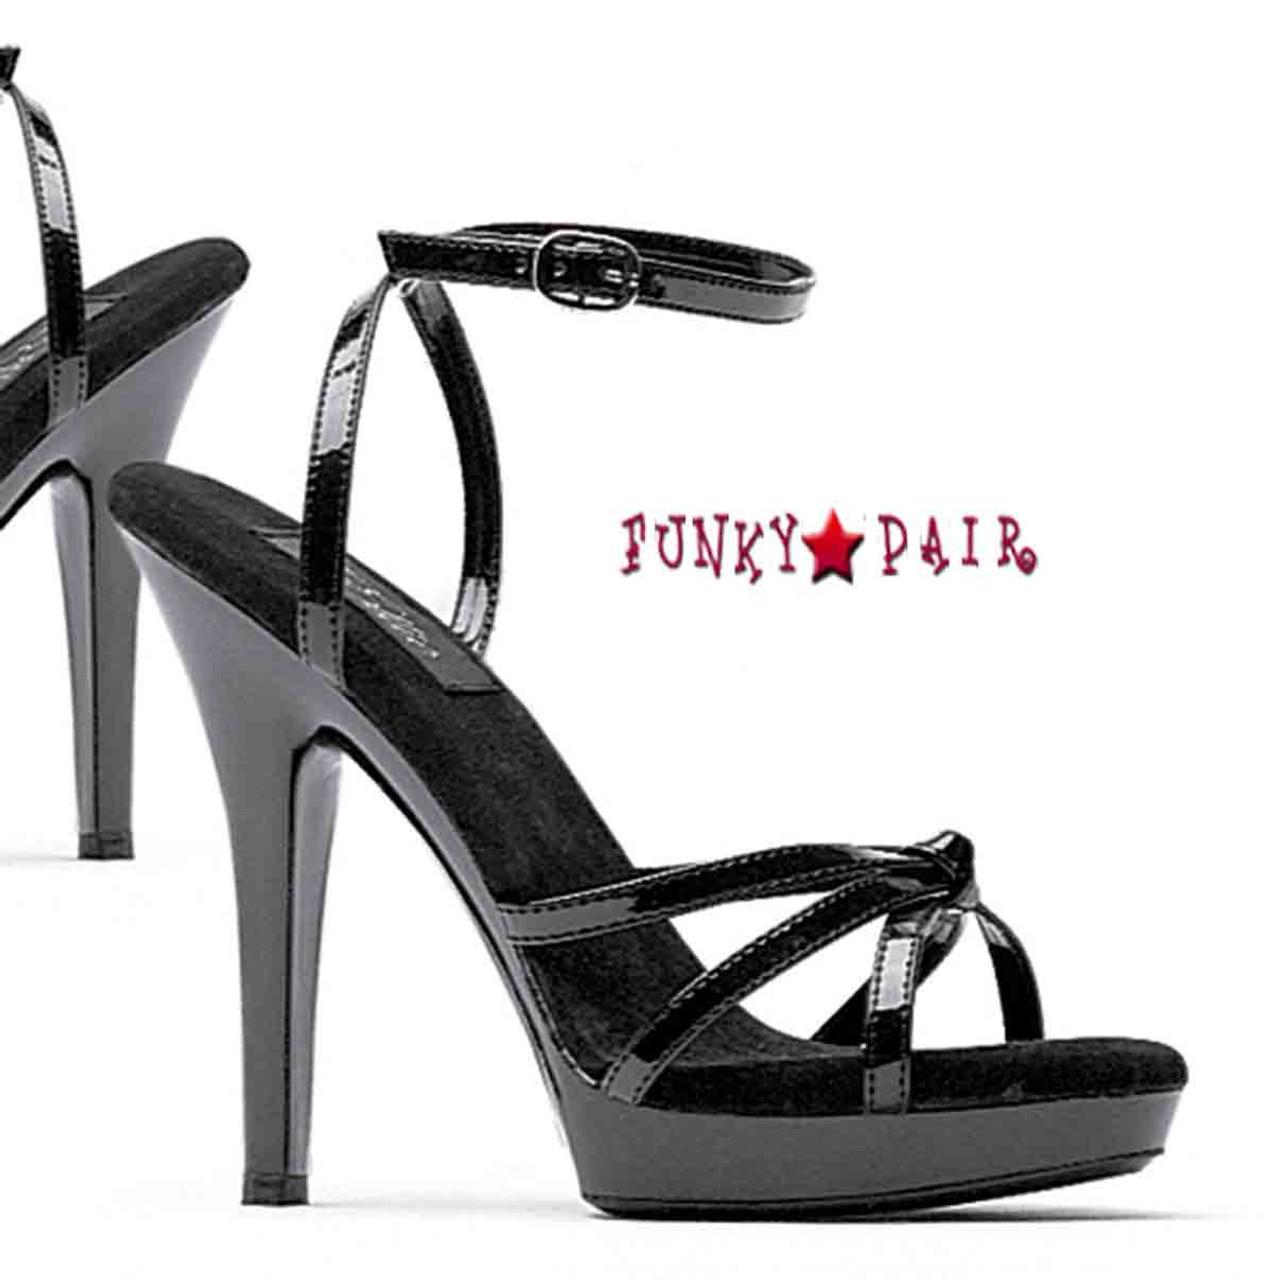 5 Inch Platform Heels